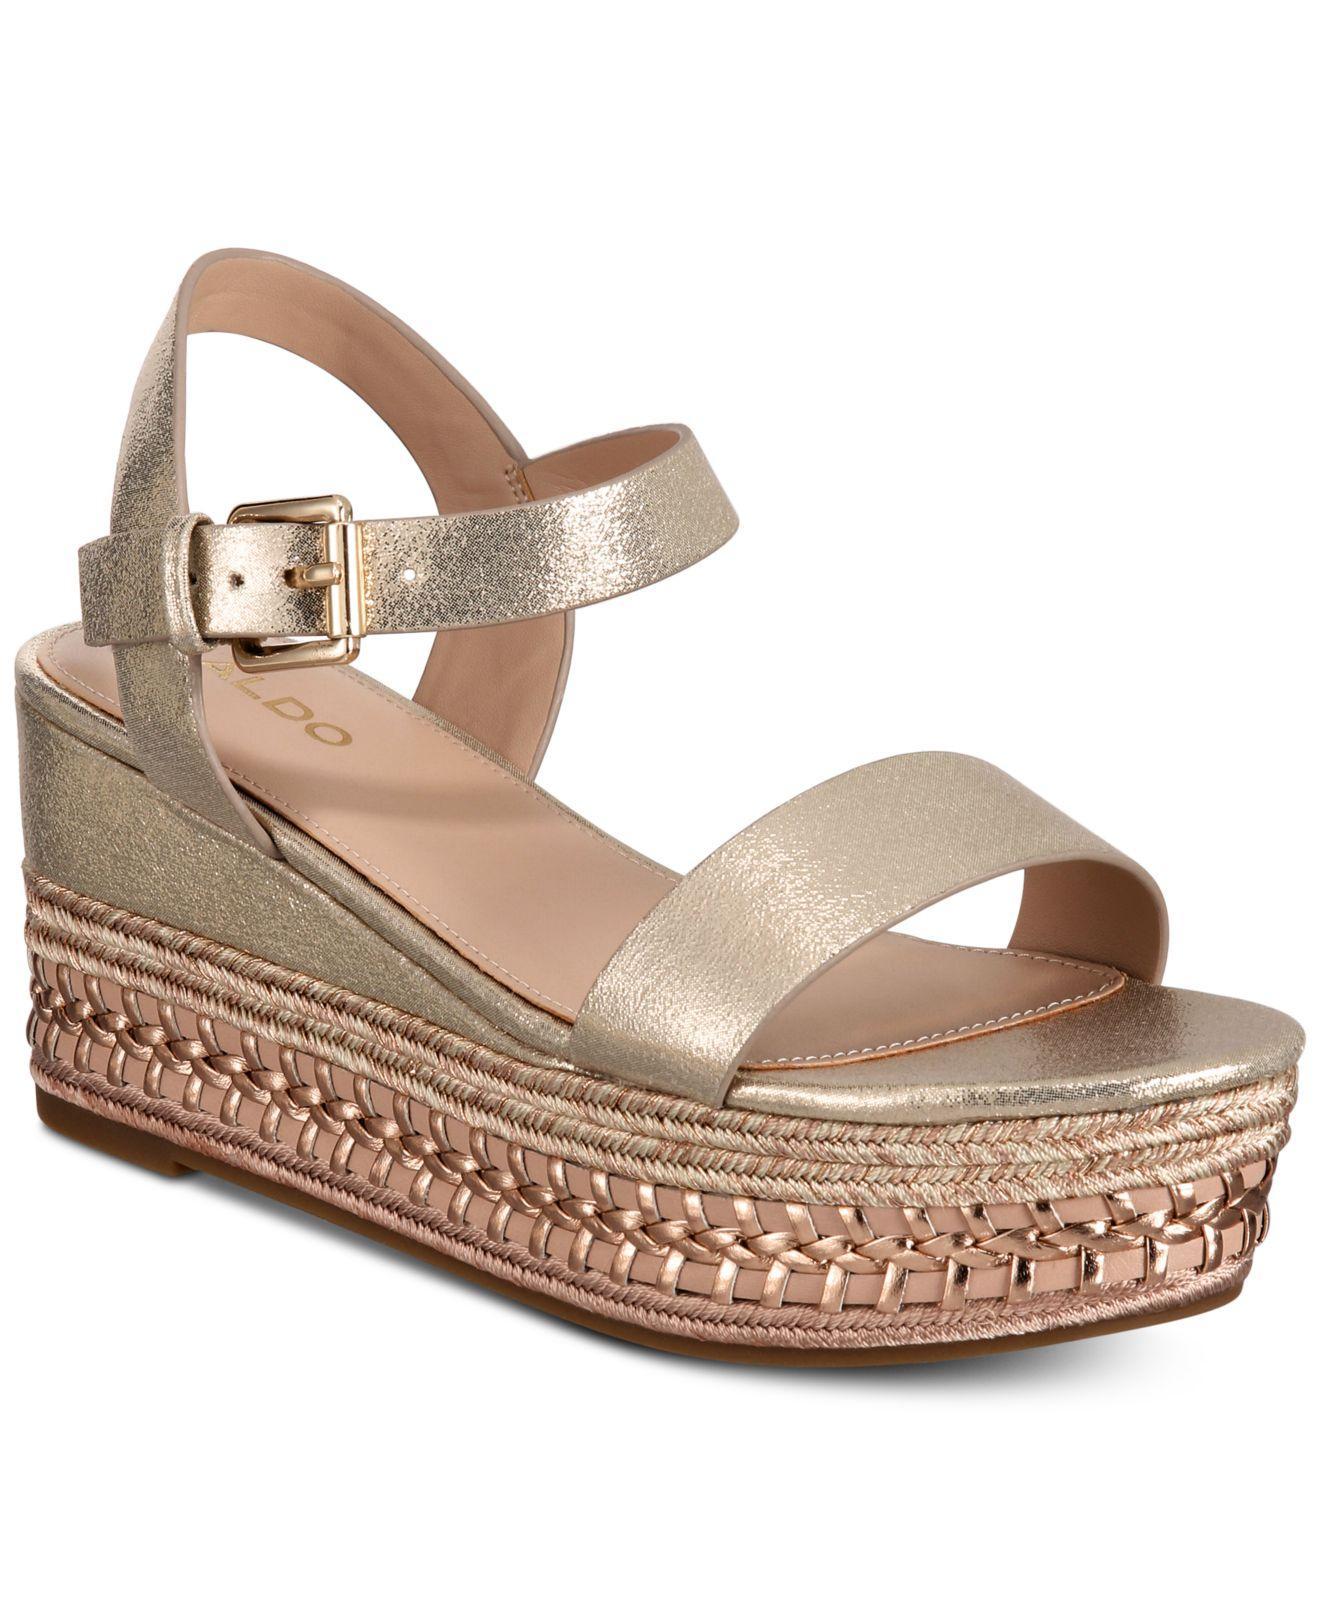 568946576a14 ALDO - Metallic Mauma Wedge Sandals - Lyst. View fullscreen